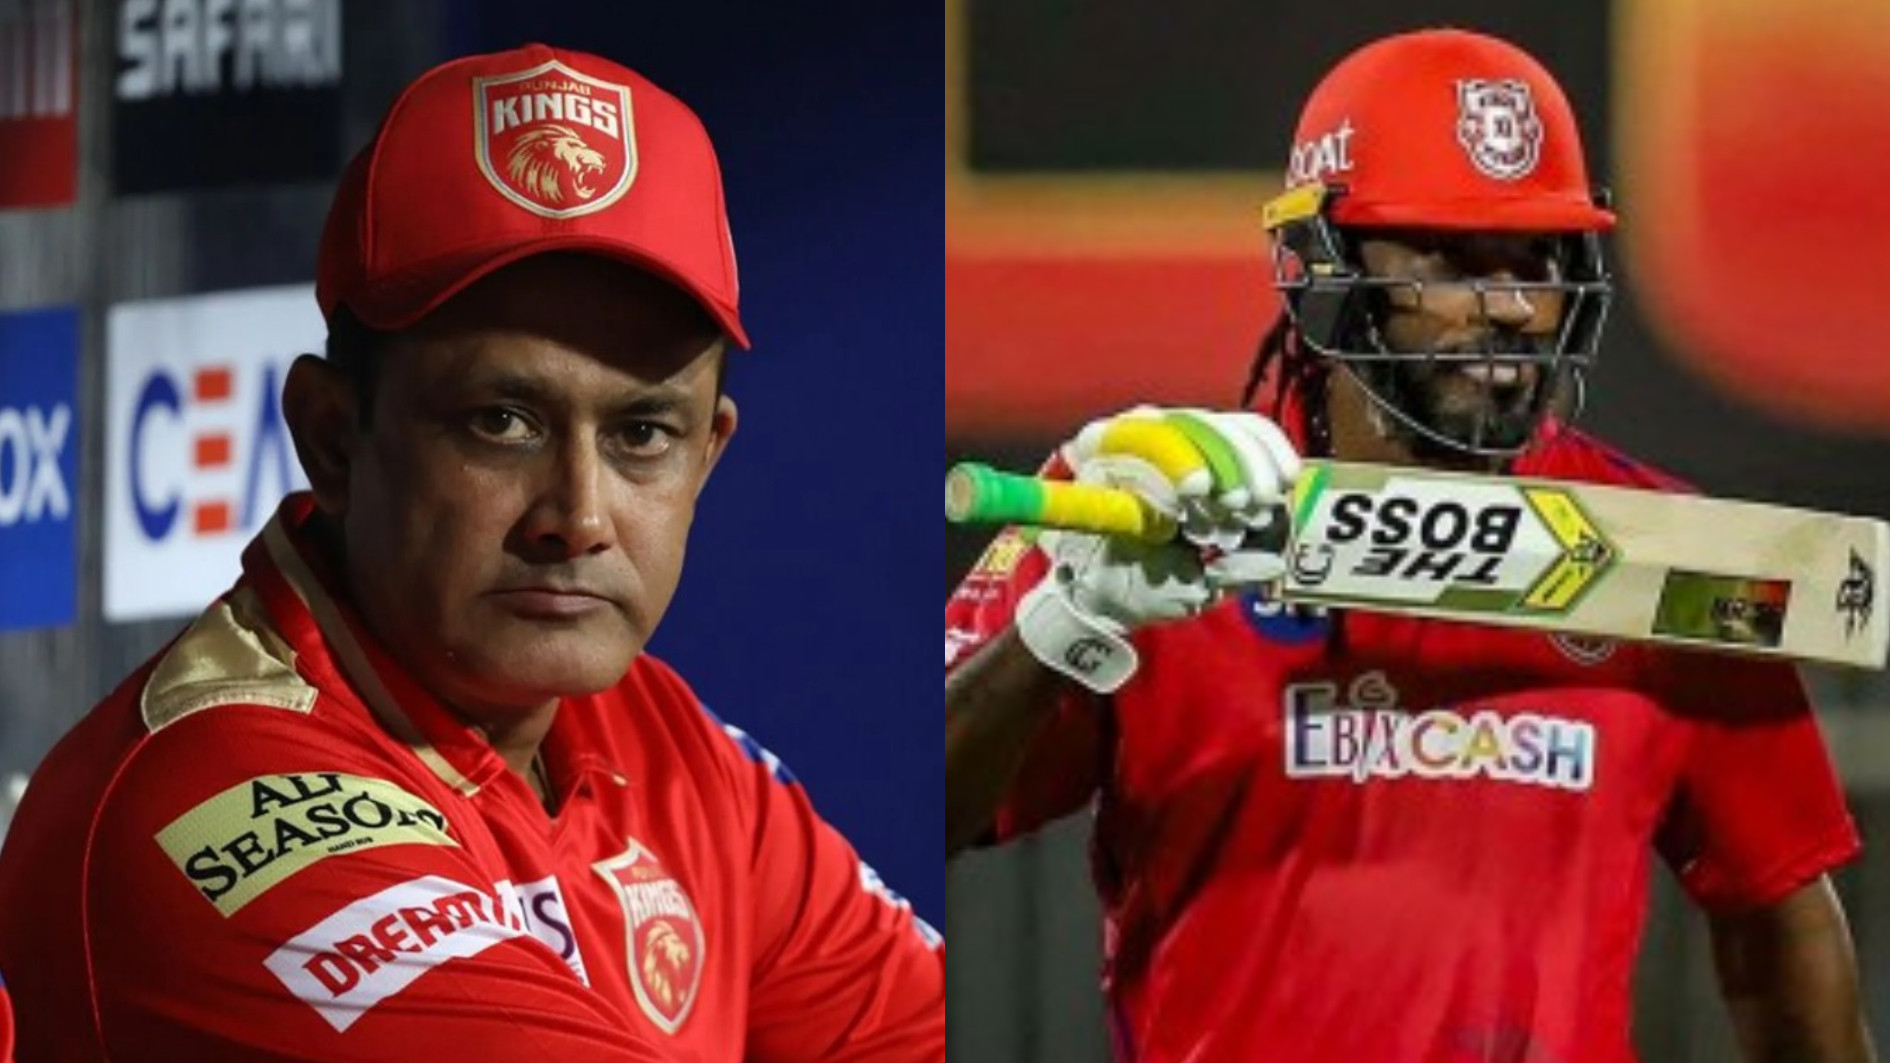 IPL 2021: He'll bench Bumrah and play Praveen Kumar- Twitterati slam Kumble for PBKS XI selection